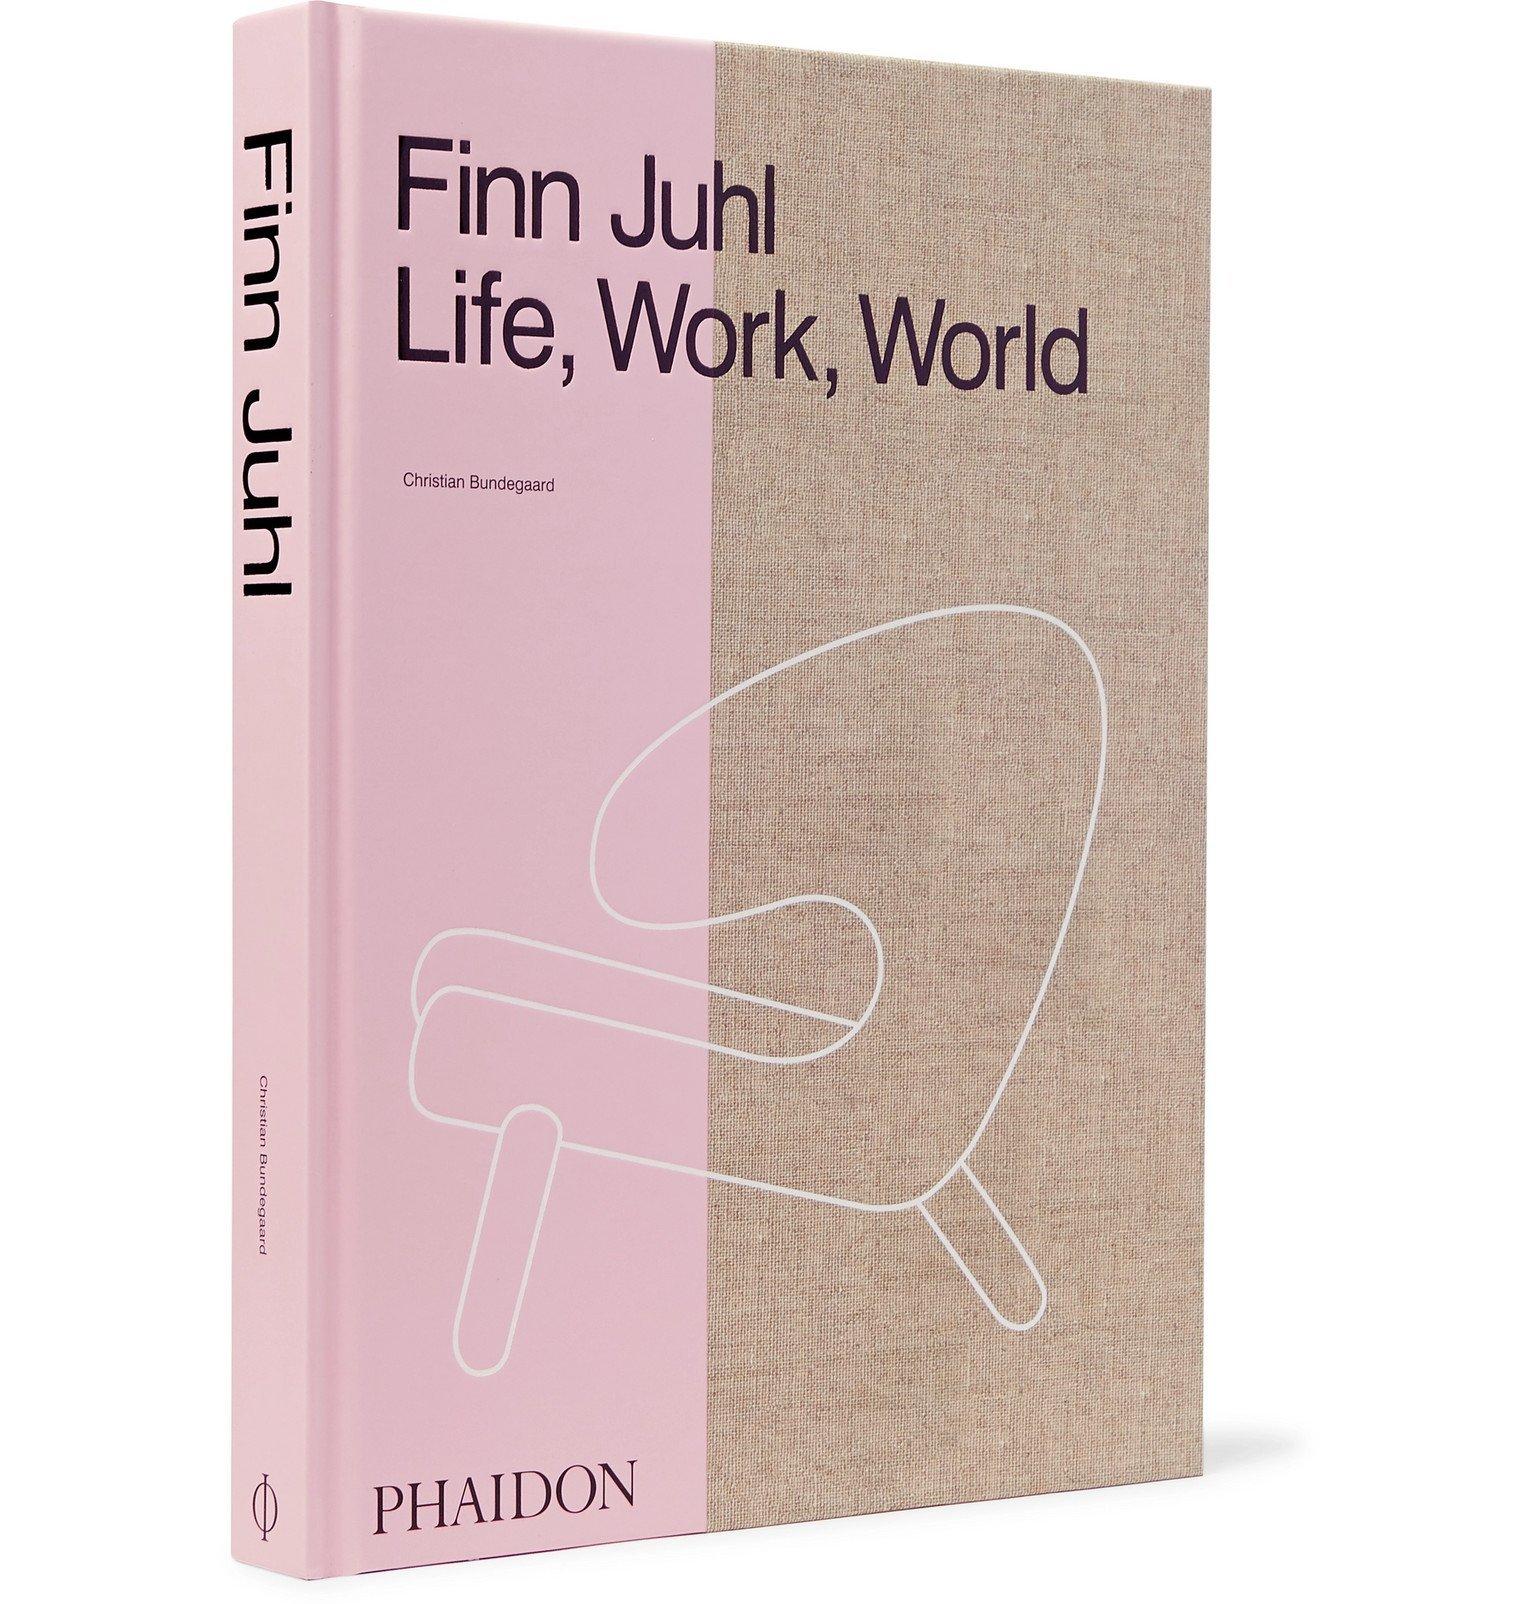 Photo: Phaidon - Finn Juhl: Life, Work, World Hardcover Book - Multi